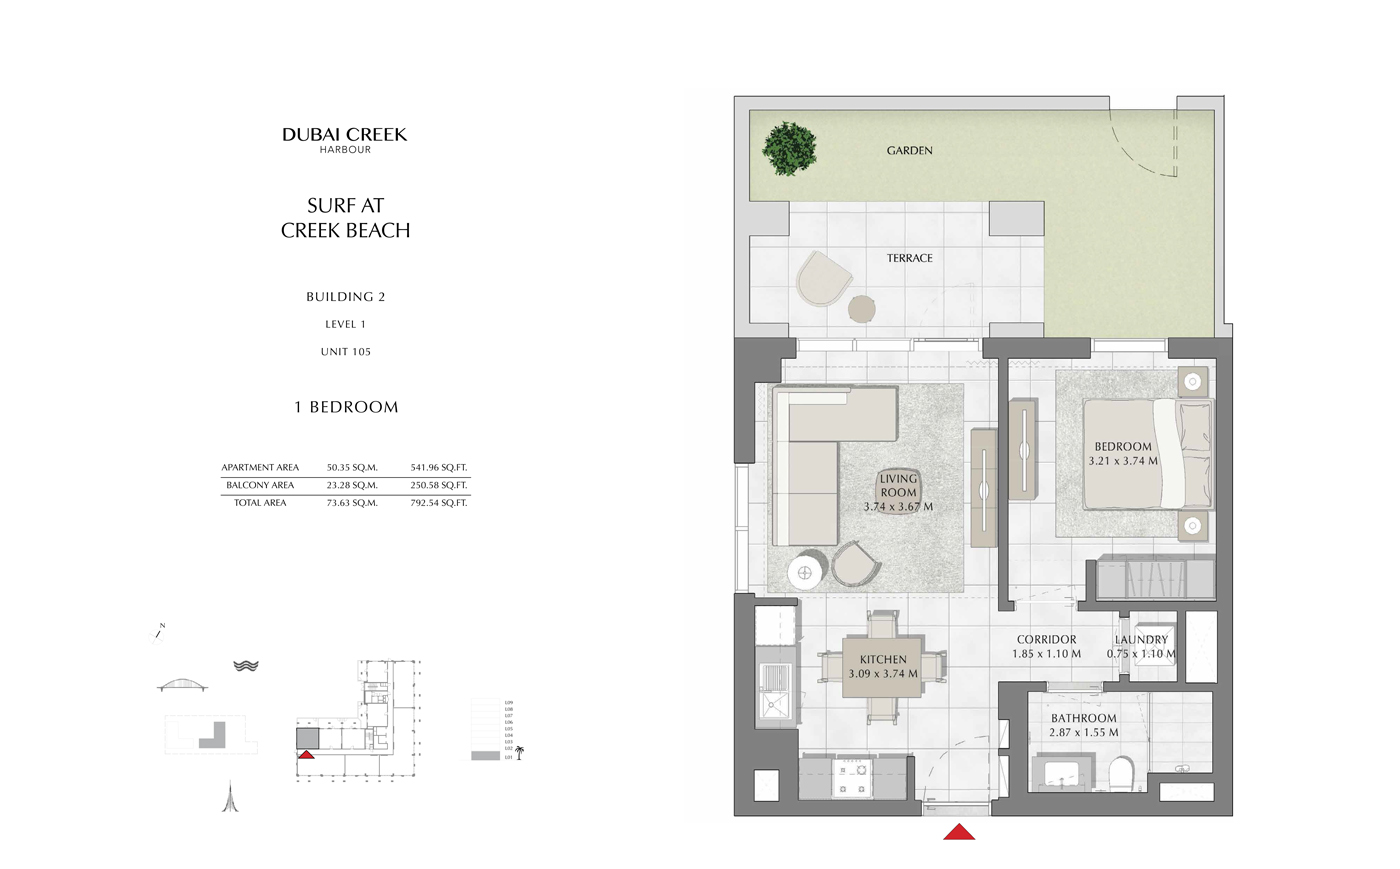 Building 2, 1 Bedroom Level 1, Unit 105, Size 792 Sq Ft